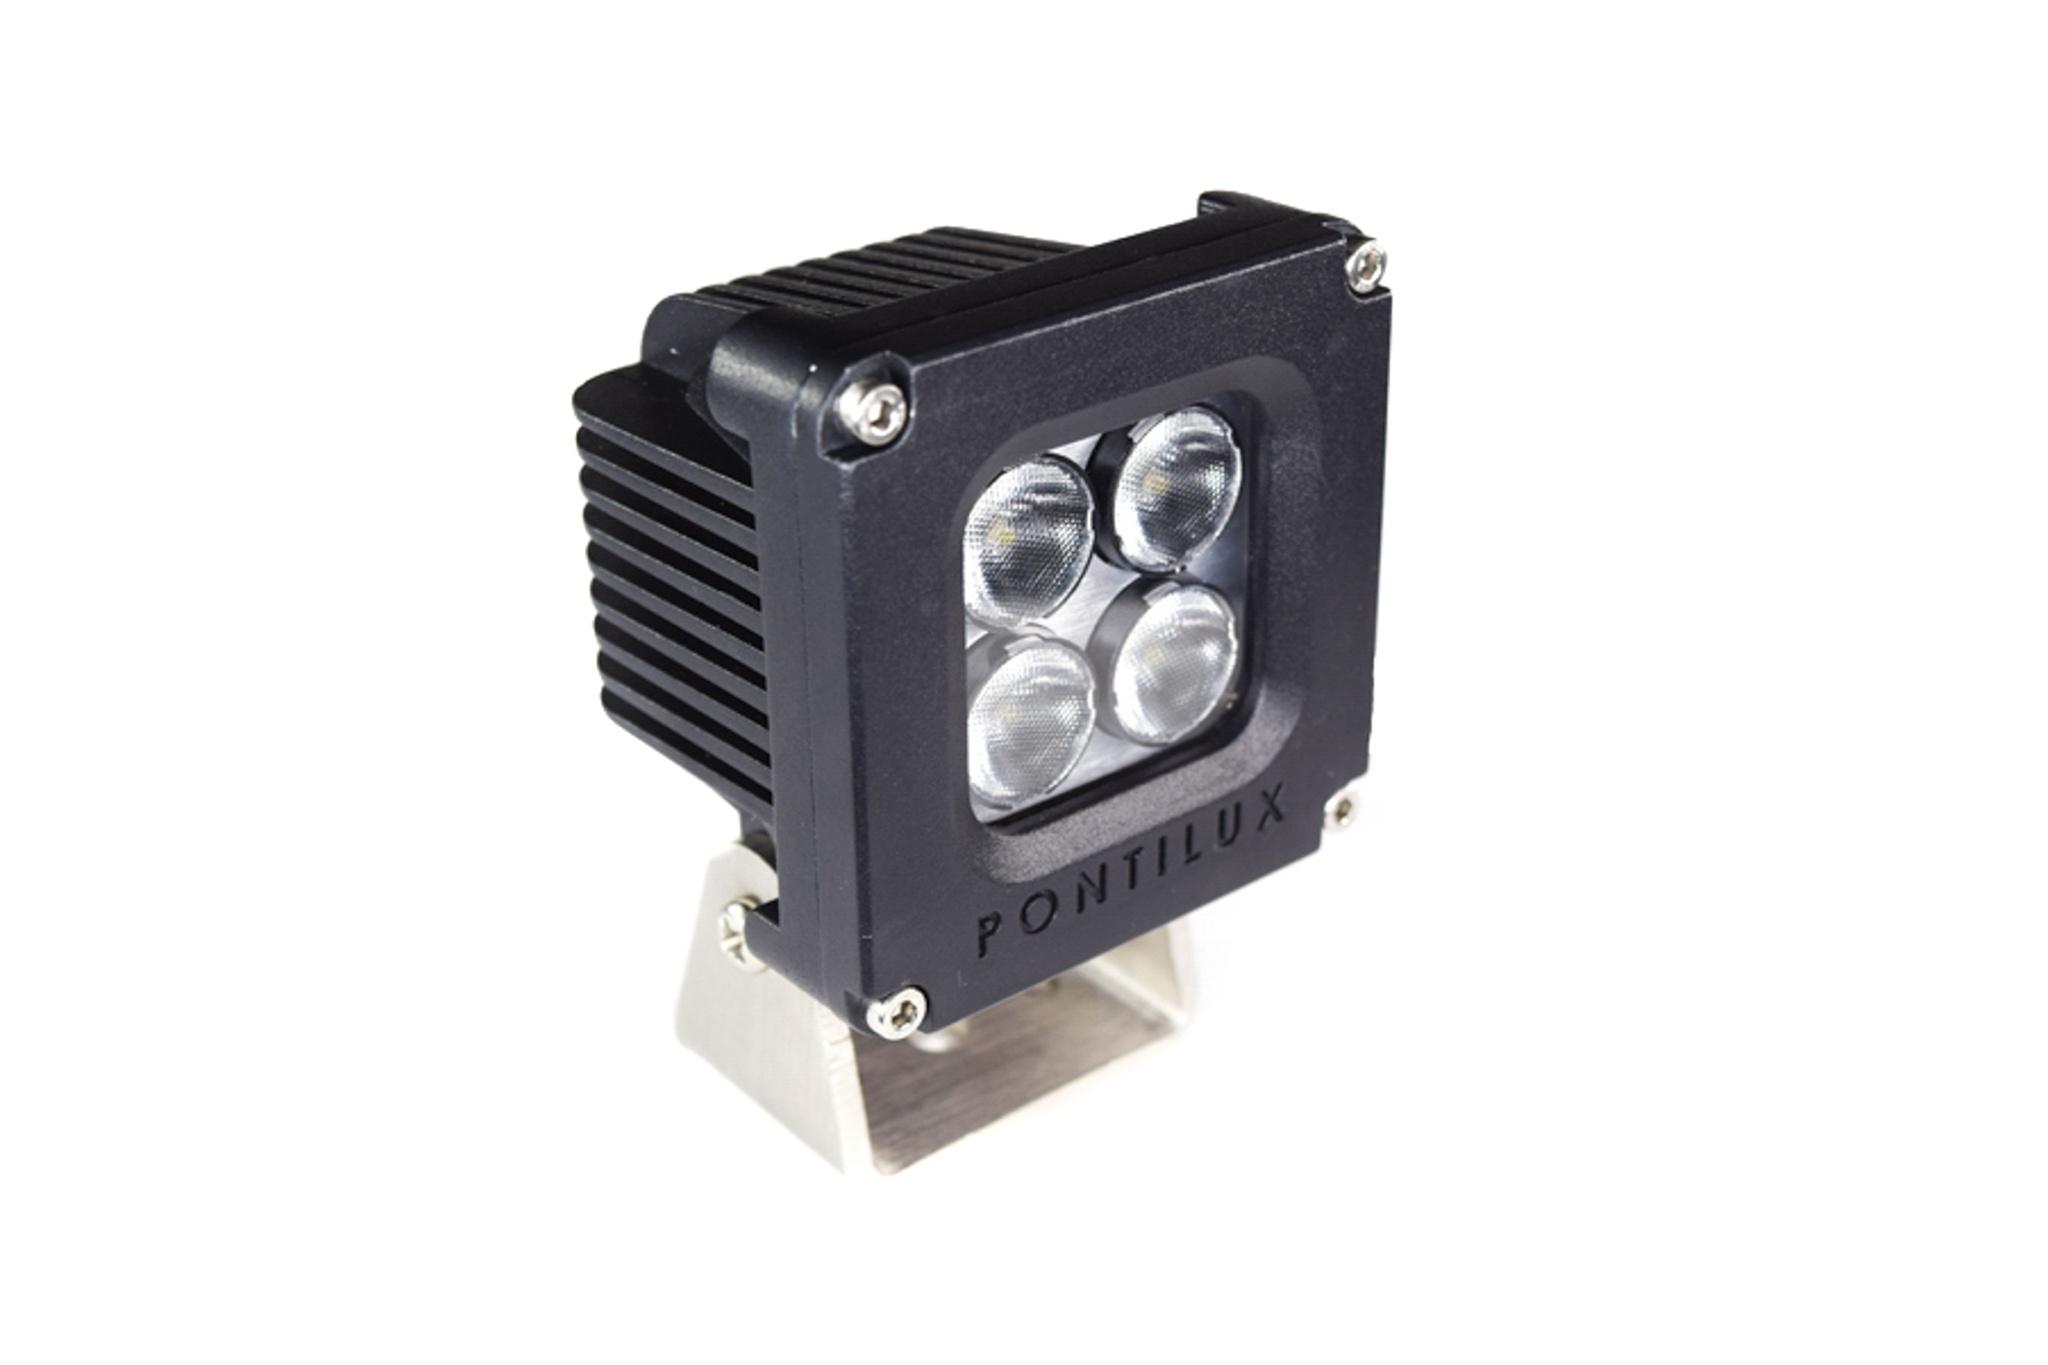 PX04 Marine LED Fixture